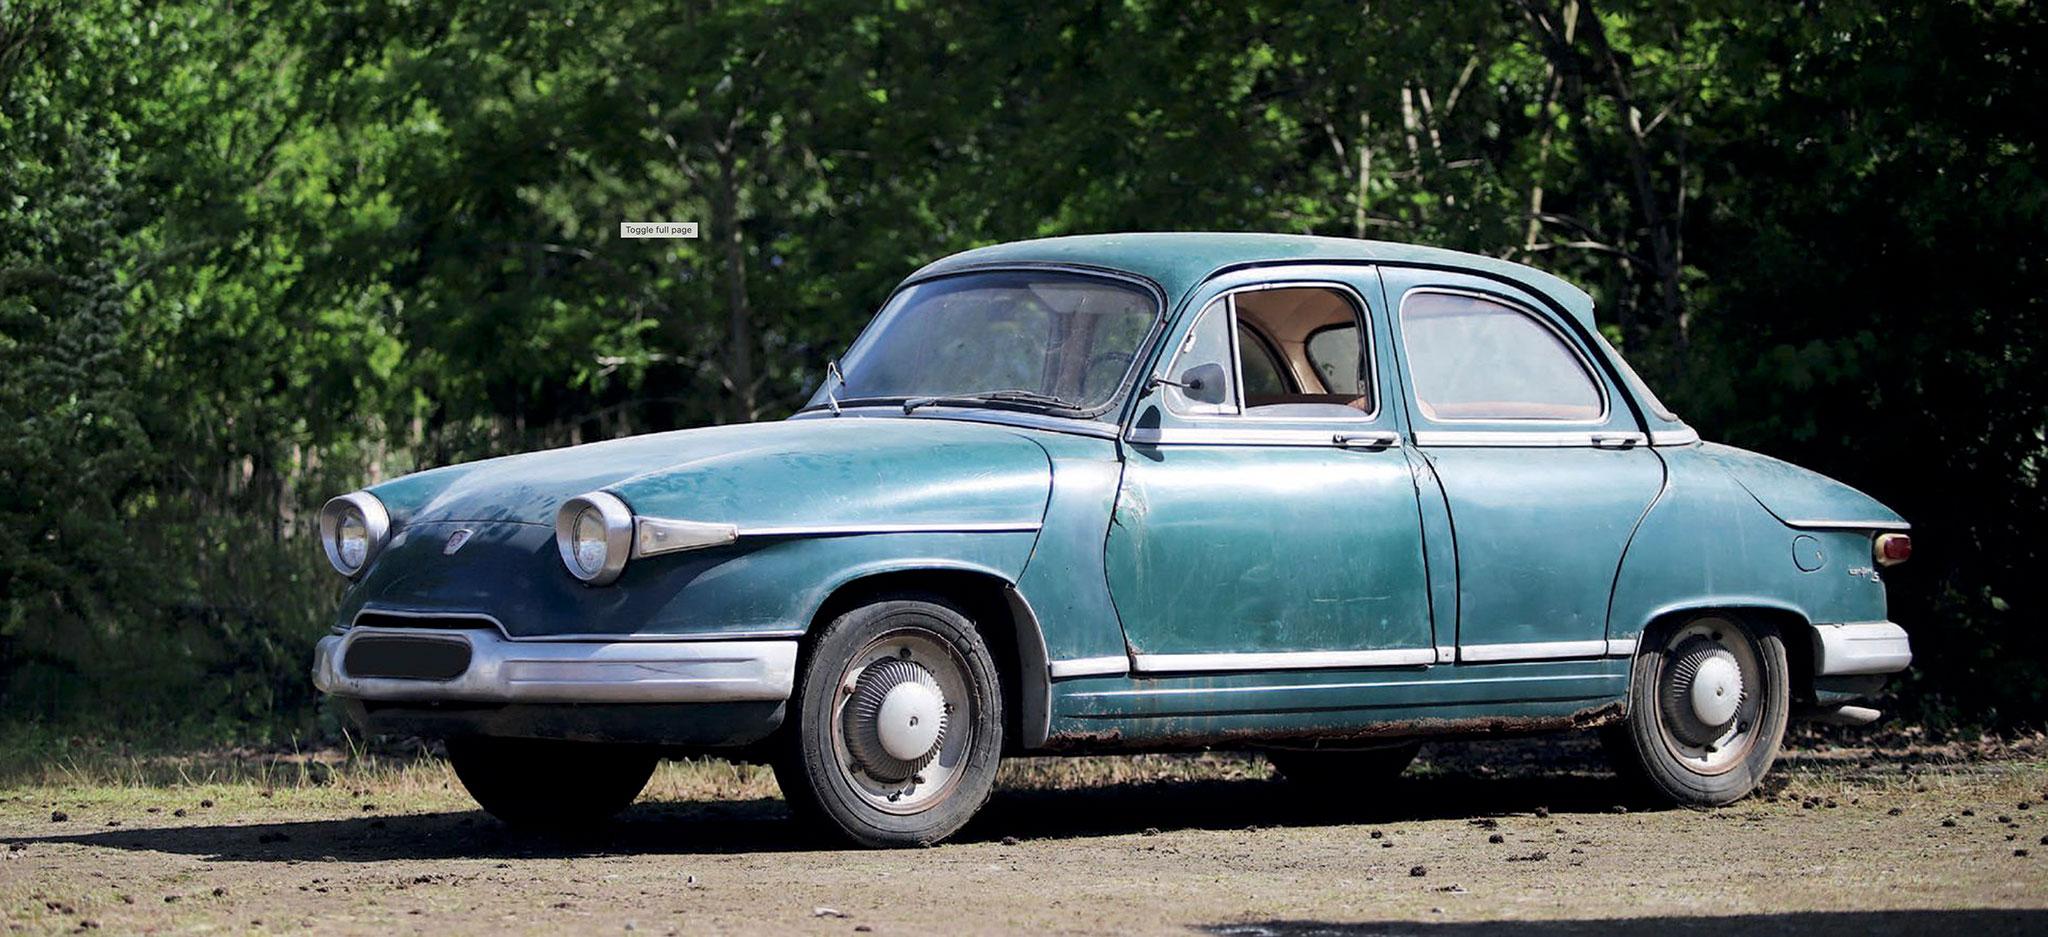 1965 Panhard PL17 Berline €800 - 1200 - Populaires Françaises.